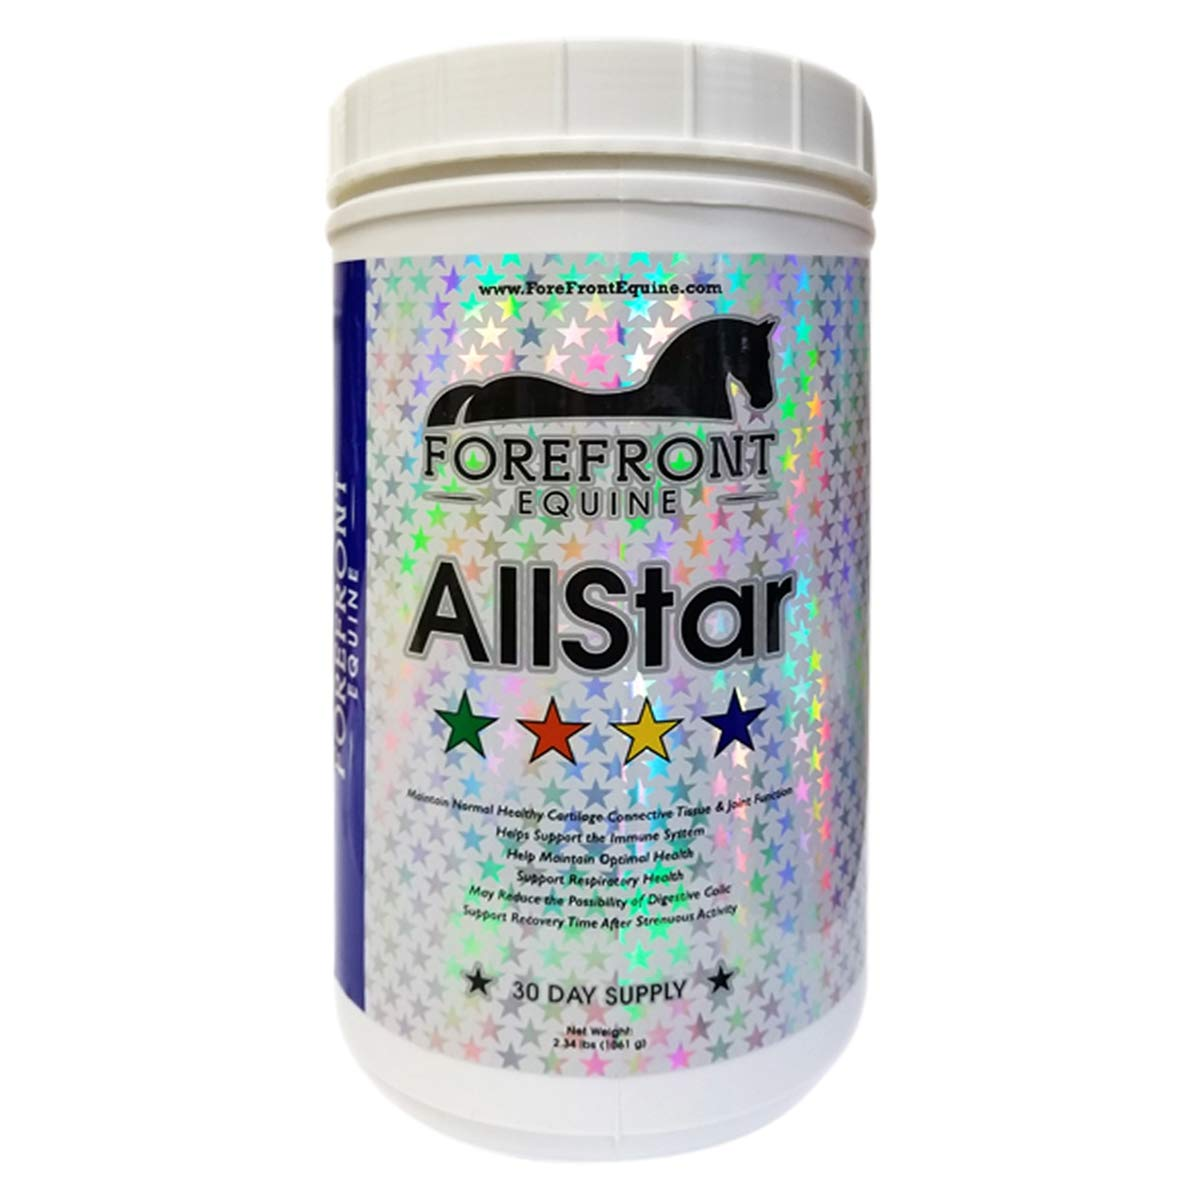 ForeFront Equine, LLC AllStar, 2.34 lb, 30 Day Supply